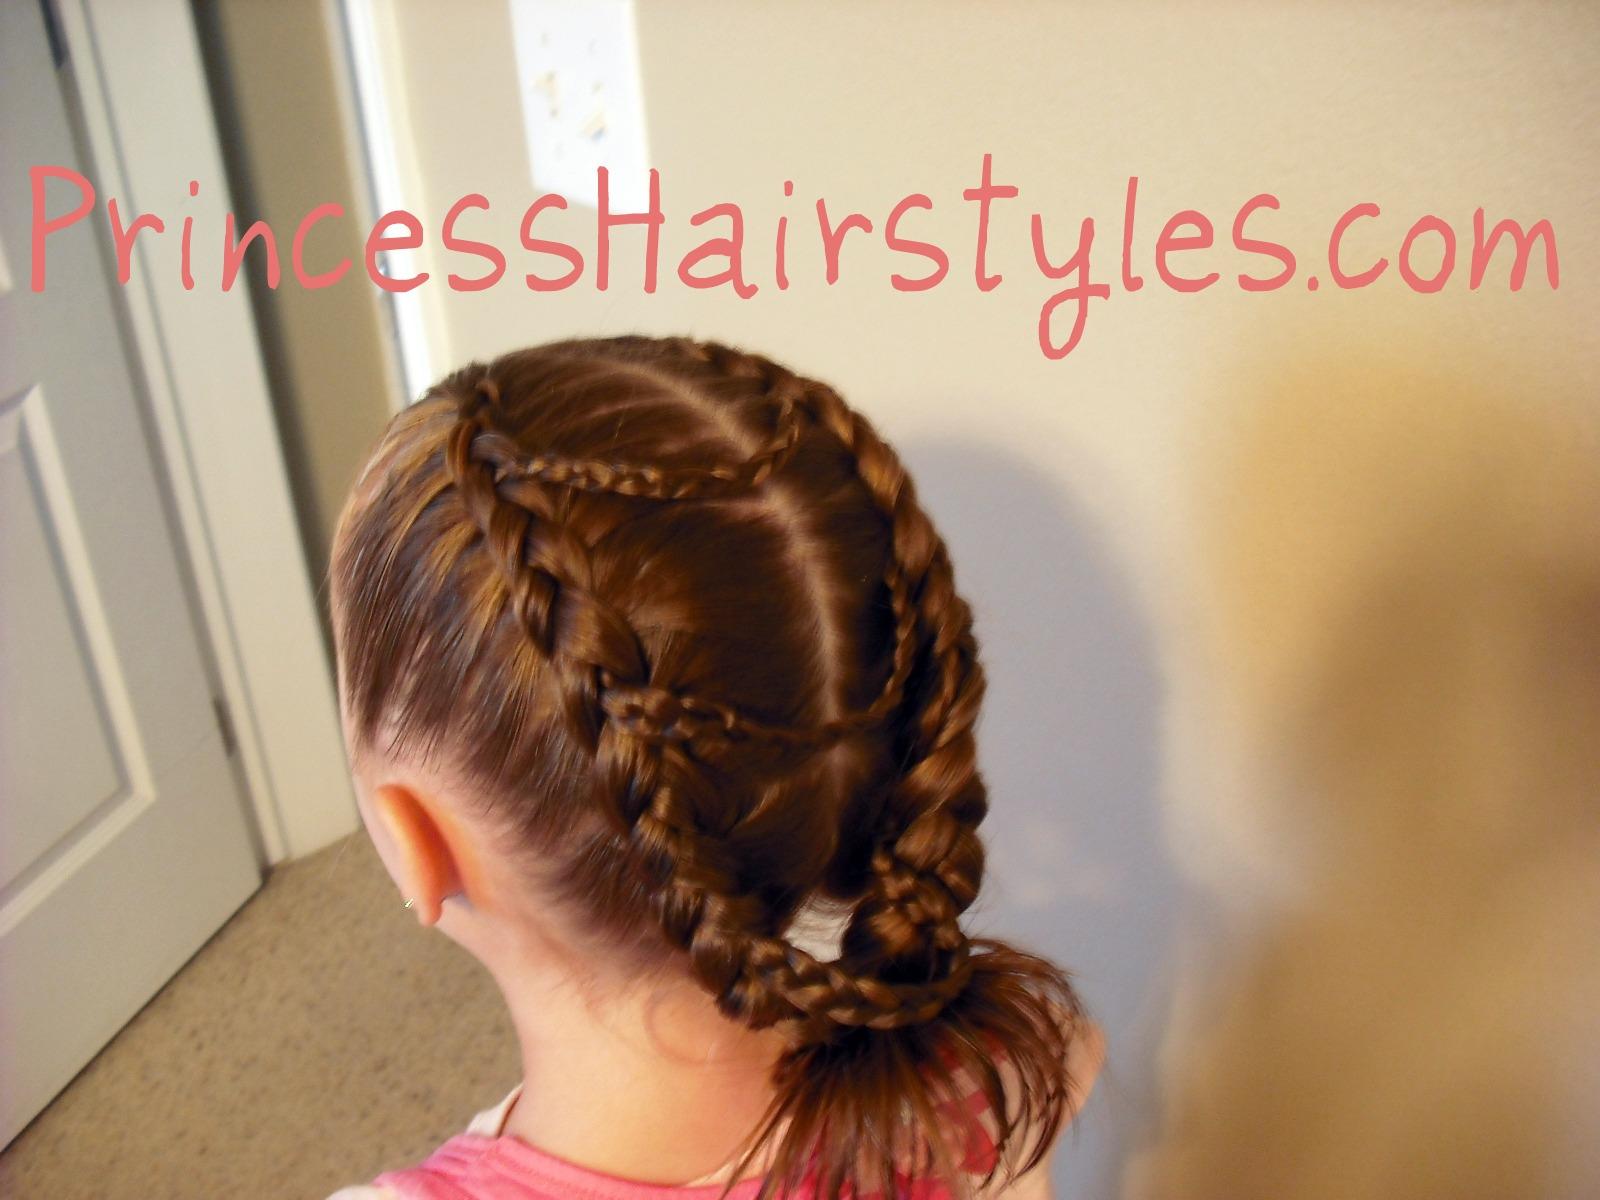 Sensational Fancy Princess Braids Hairstyles For Girls Princess Hairstyles Short Hairstyles Gunalazisus